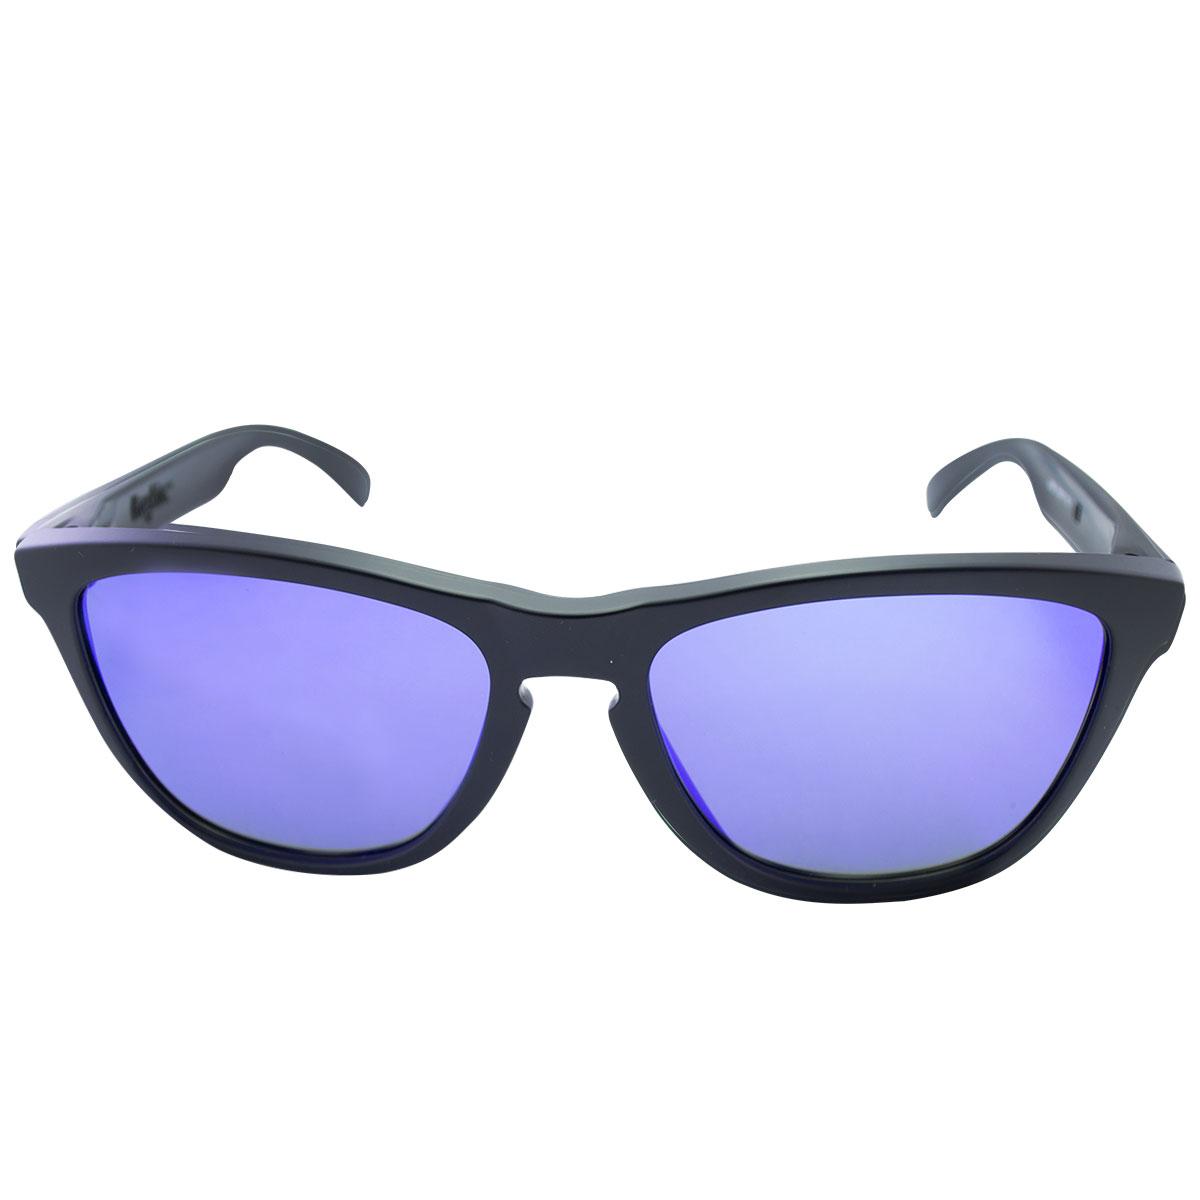 Oakley Twoface Matte Black violet Iridium   Louisiana Bucket Brigade bd6c3b3a4e